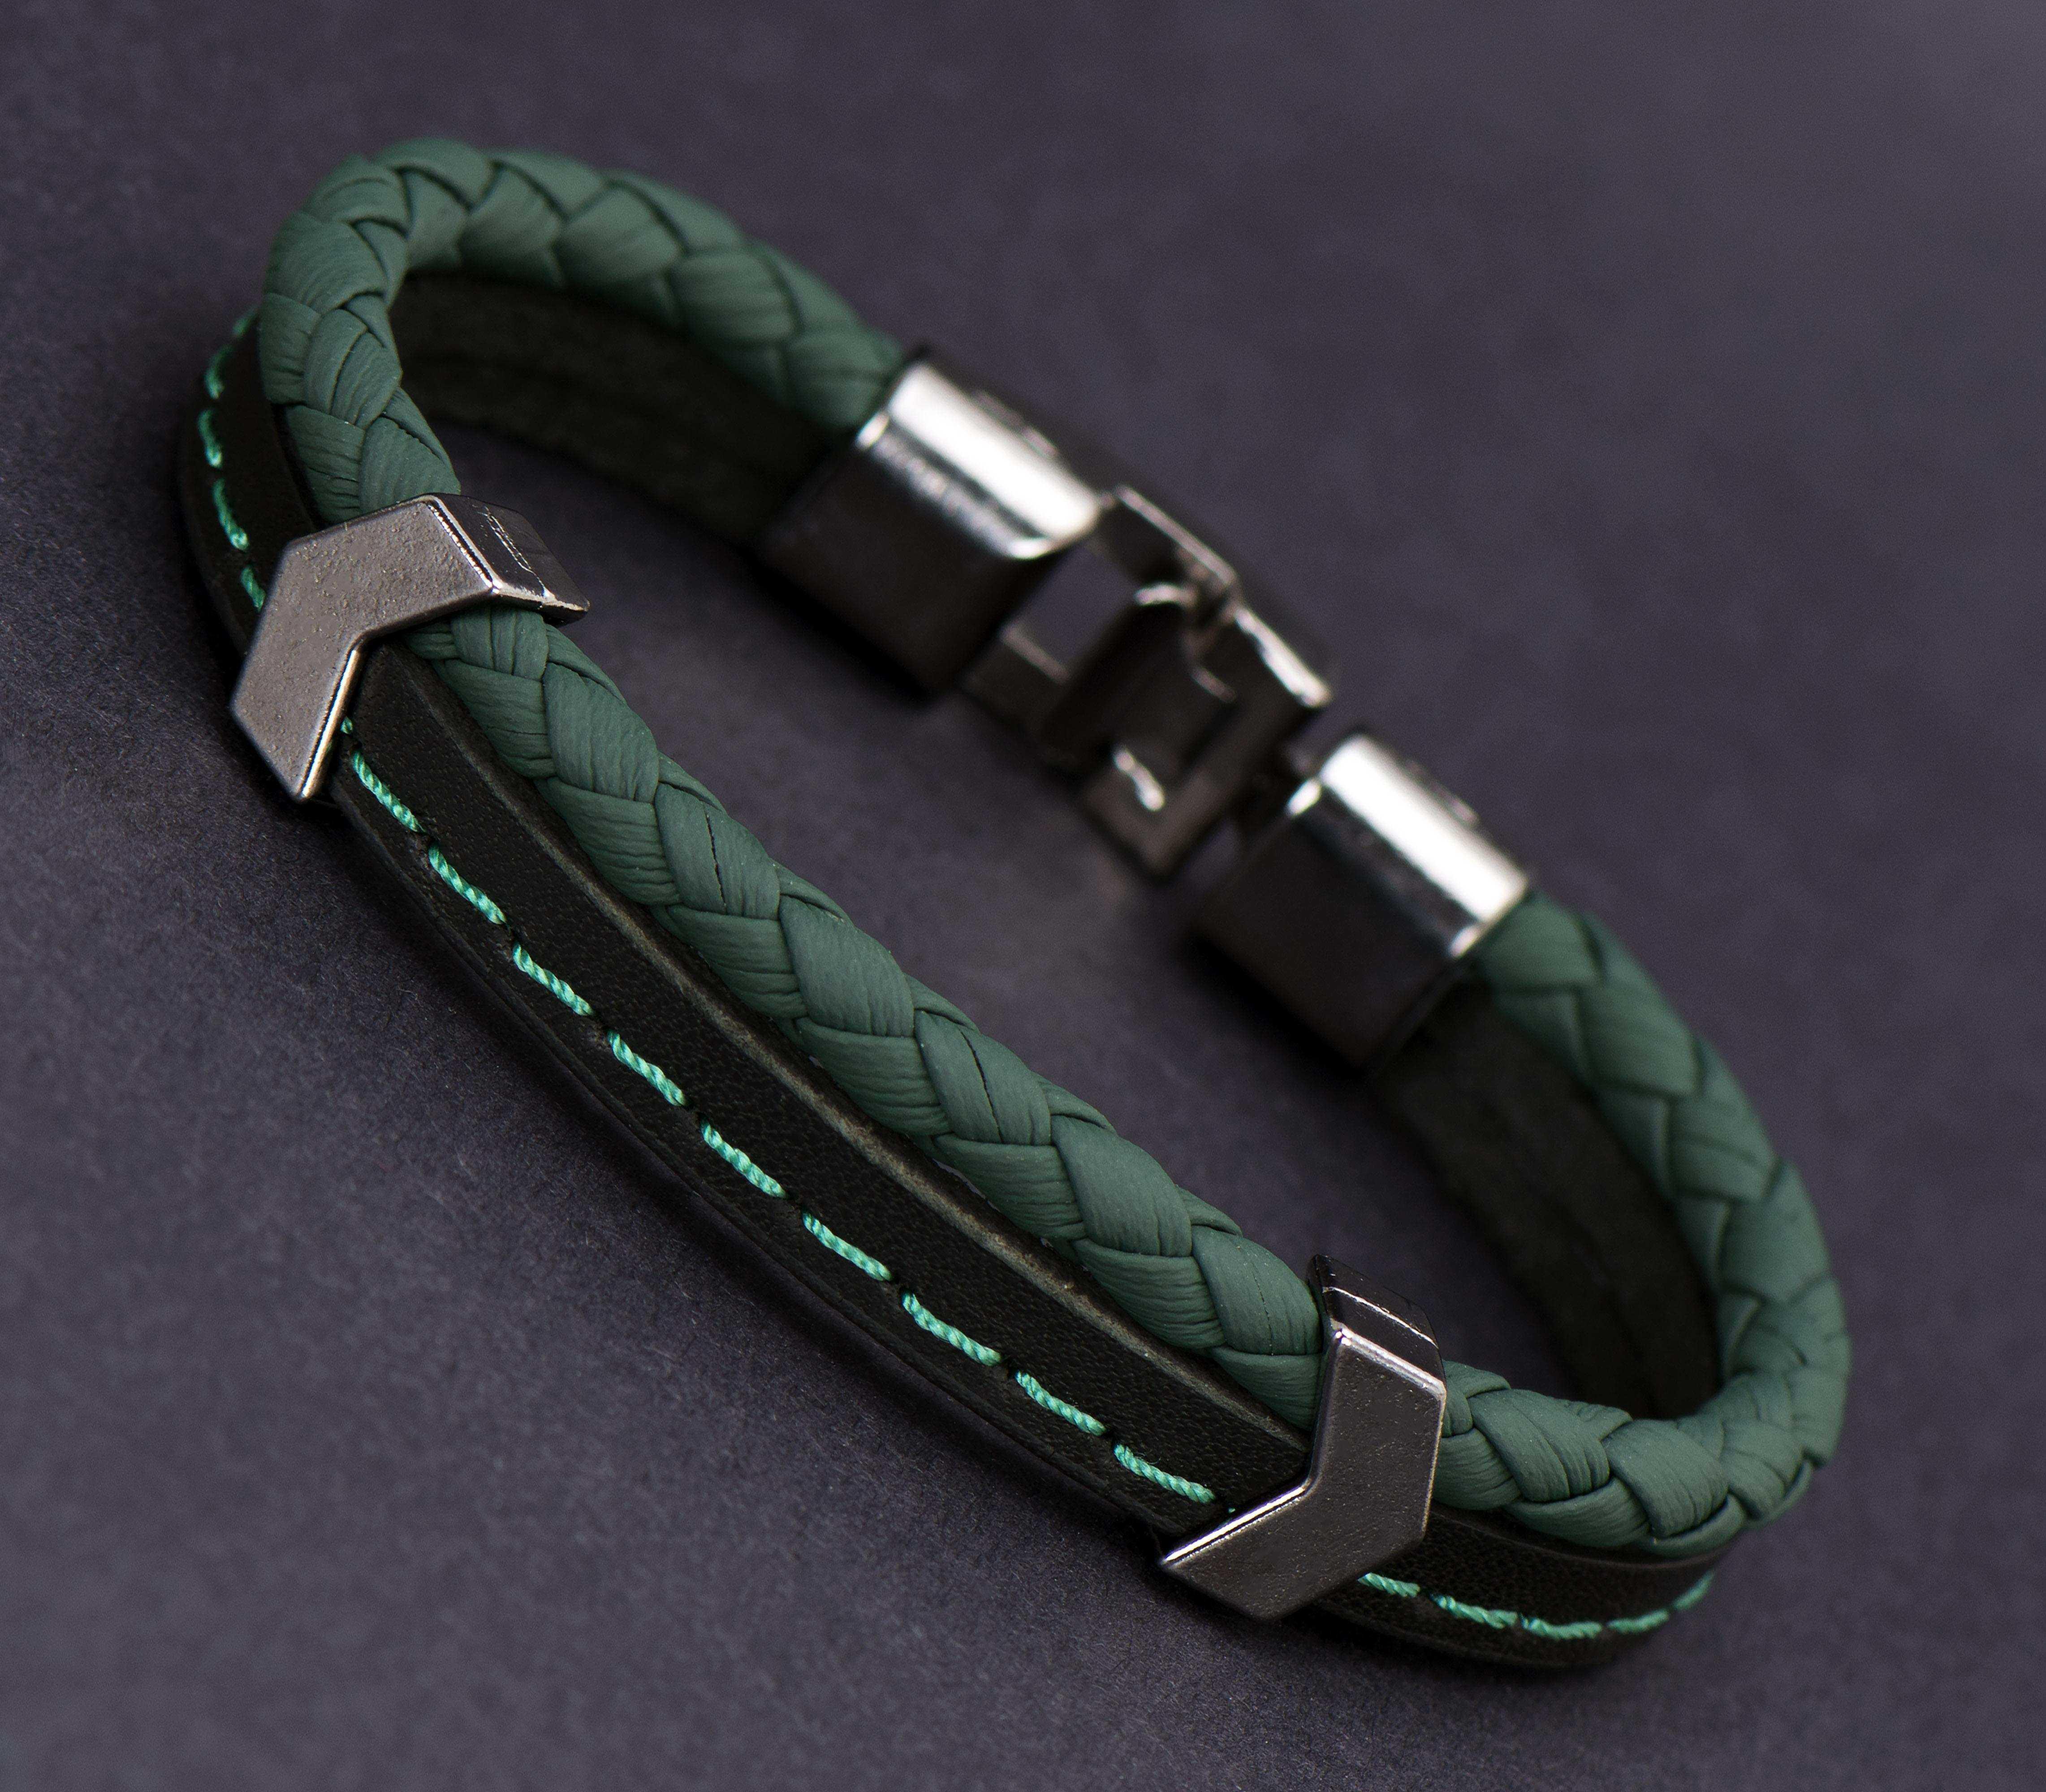 Yeşil Siyah Deri Bileklik - DER0151